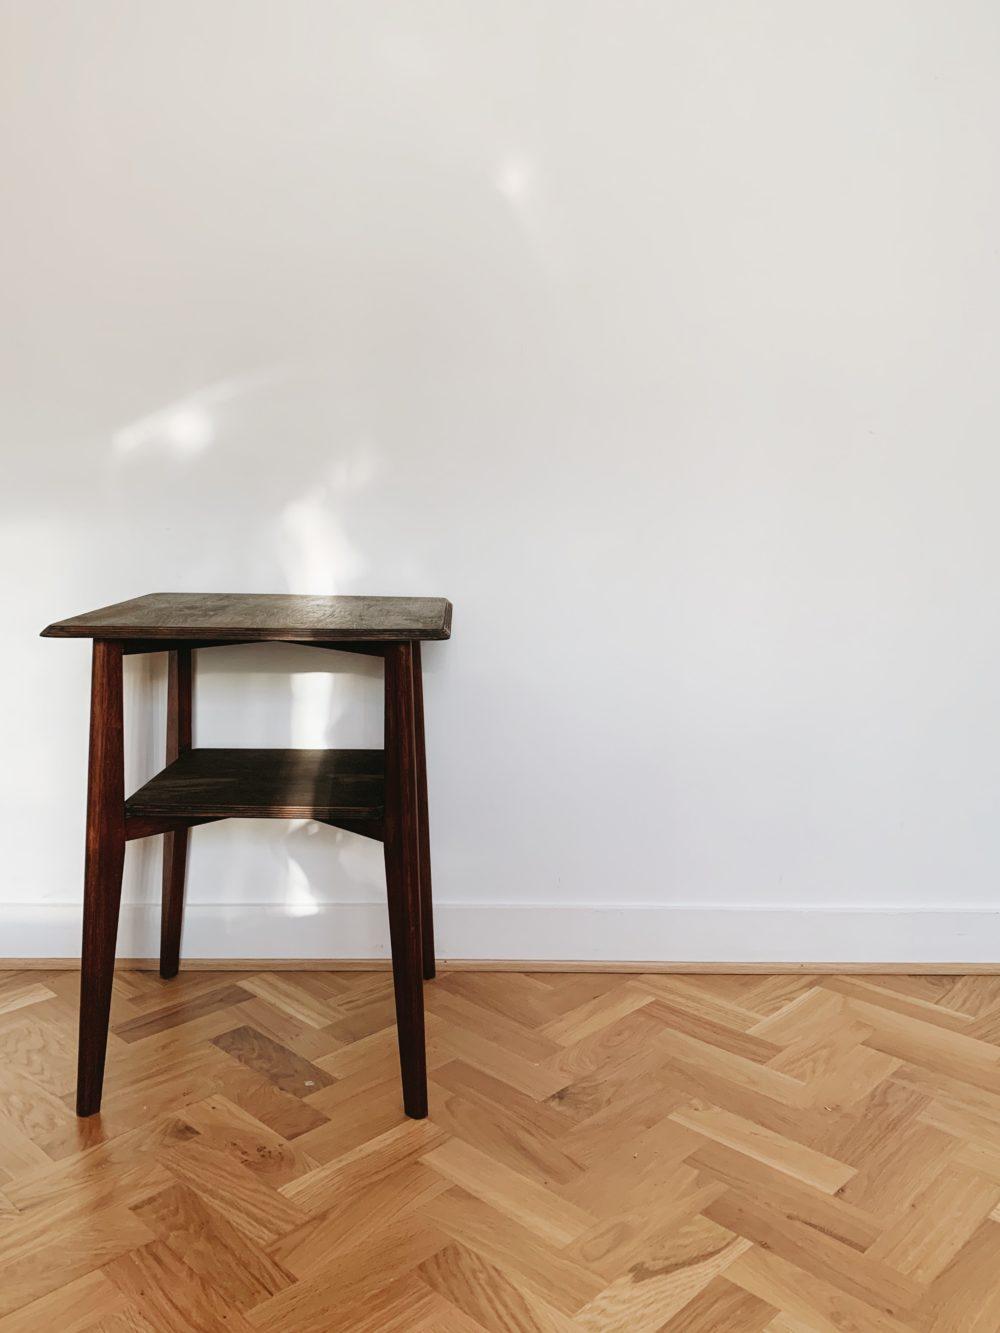 Fashionable flooring styles 4